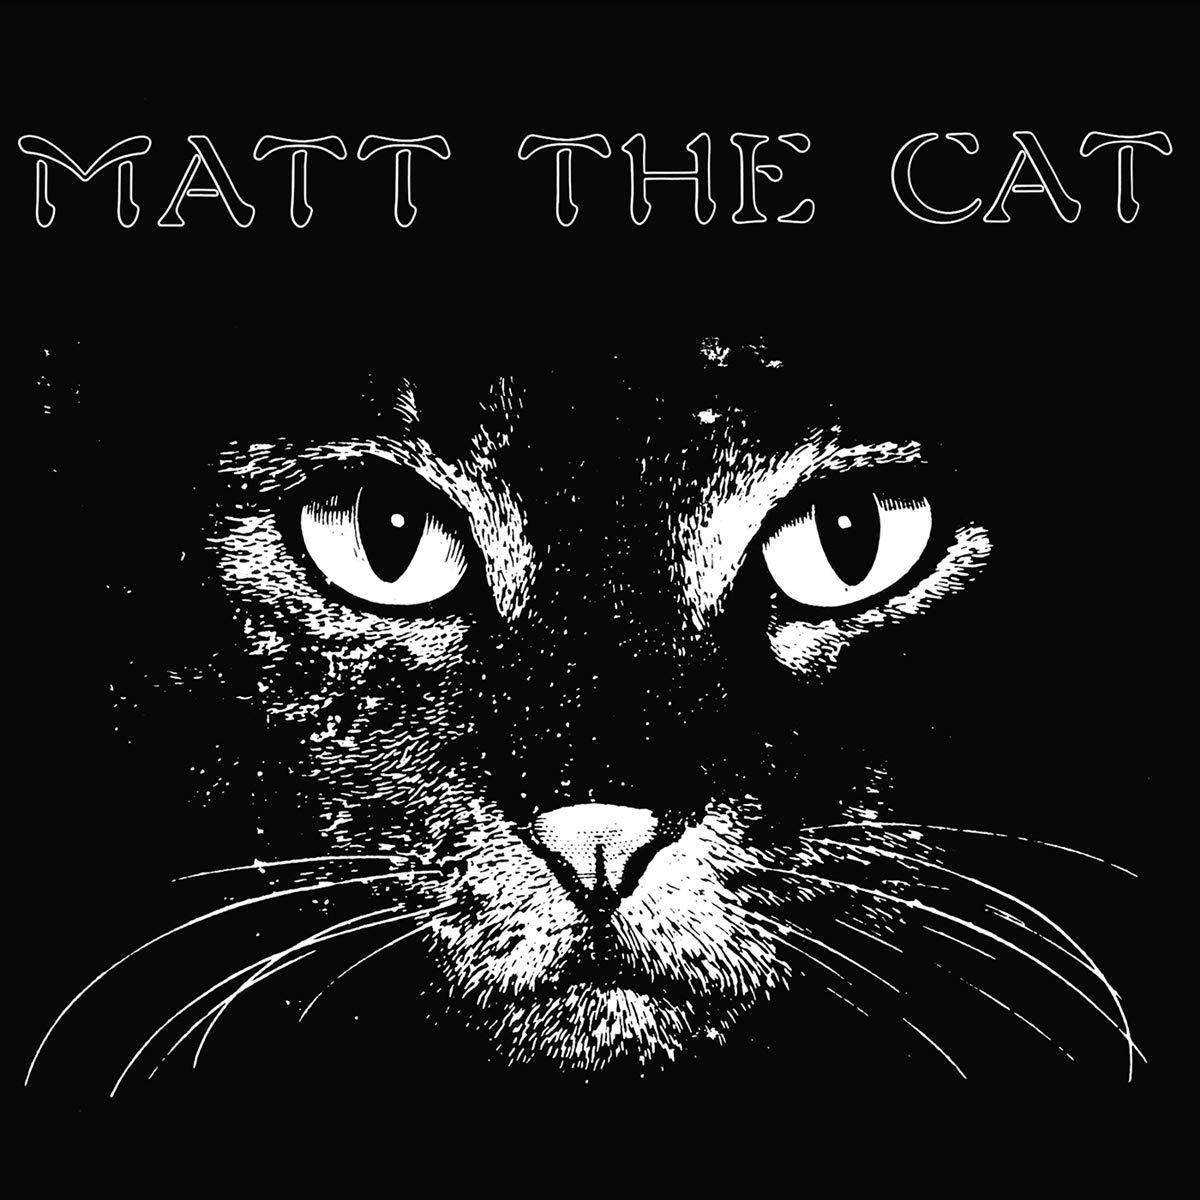 CASSELL, MATTHEW LARKIN - Matt the Cat - Amazon.com Music